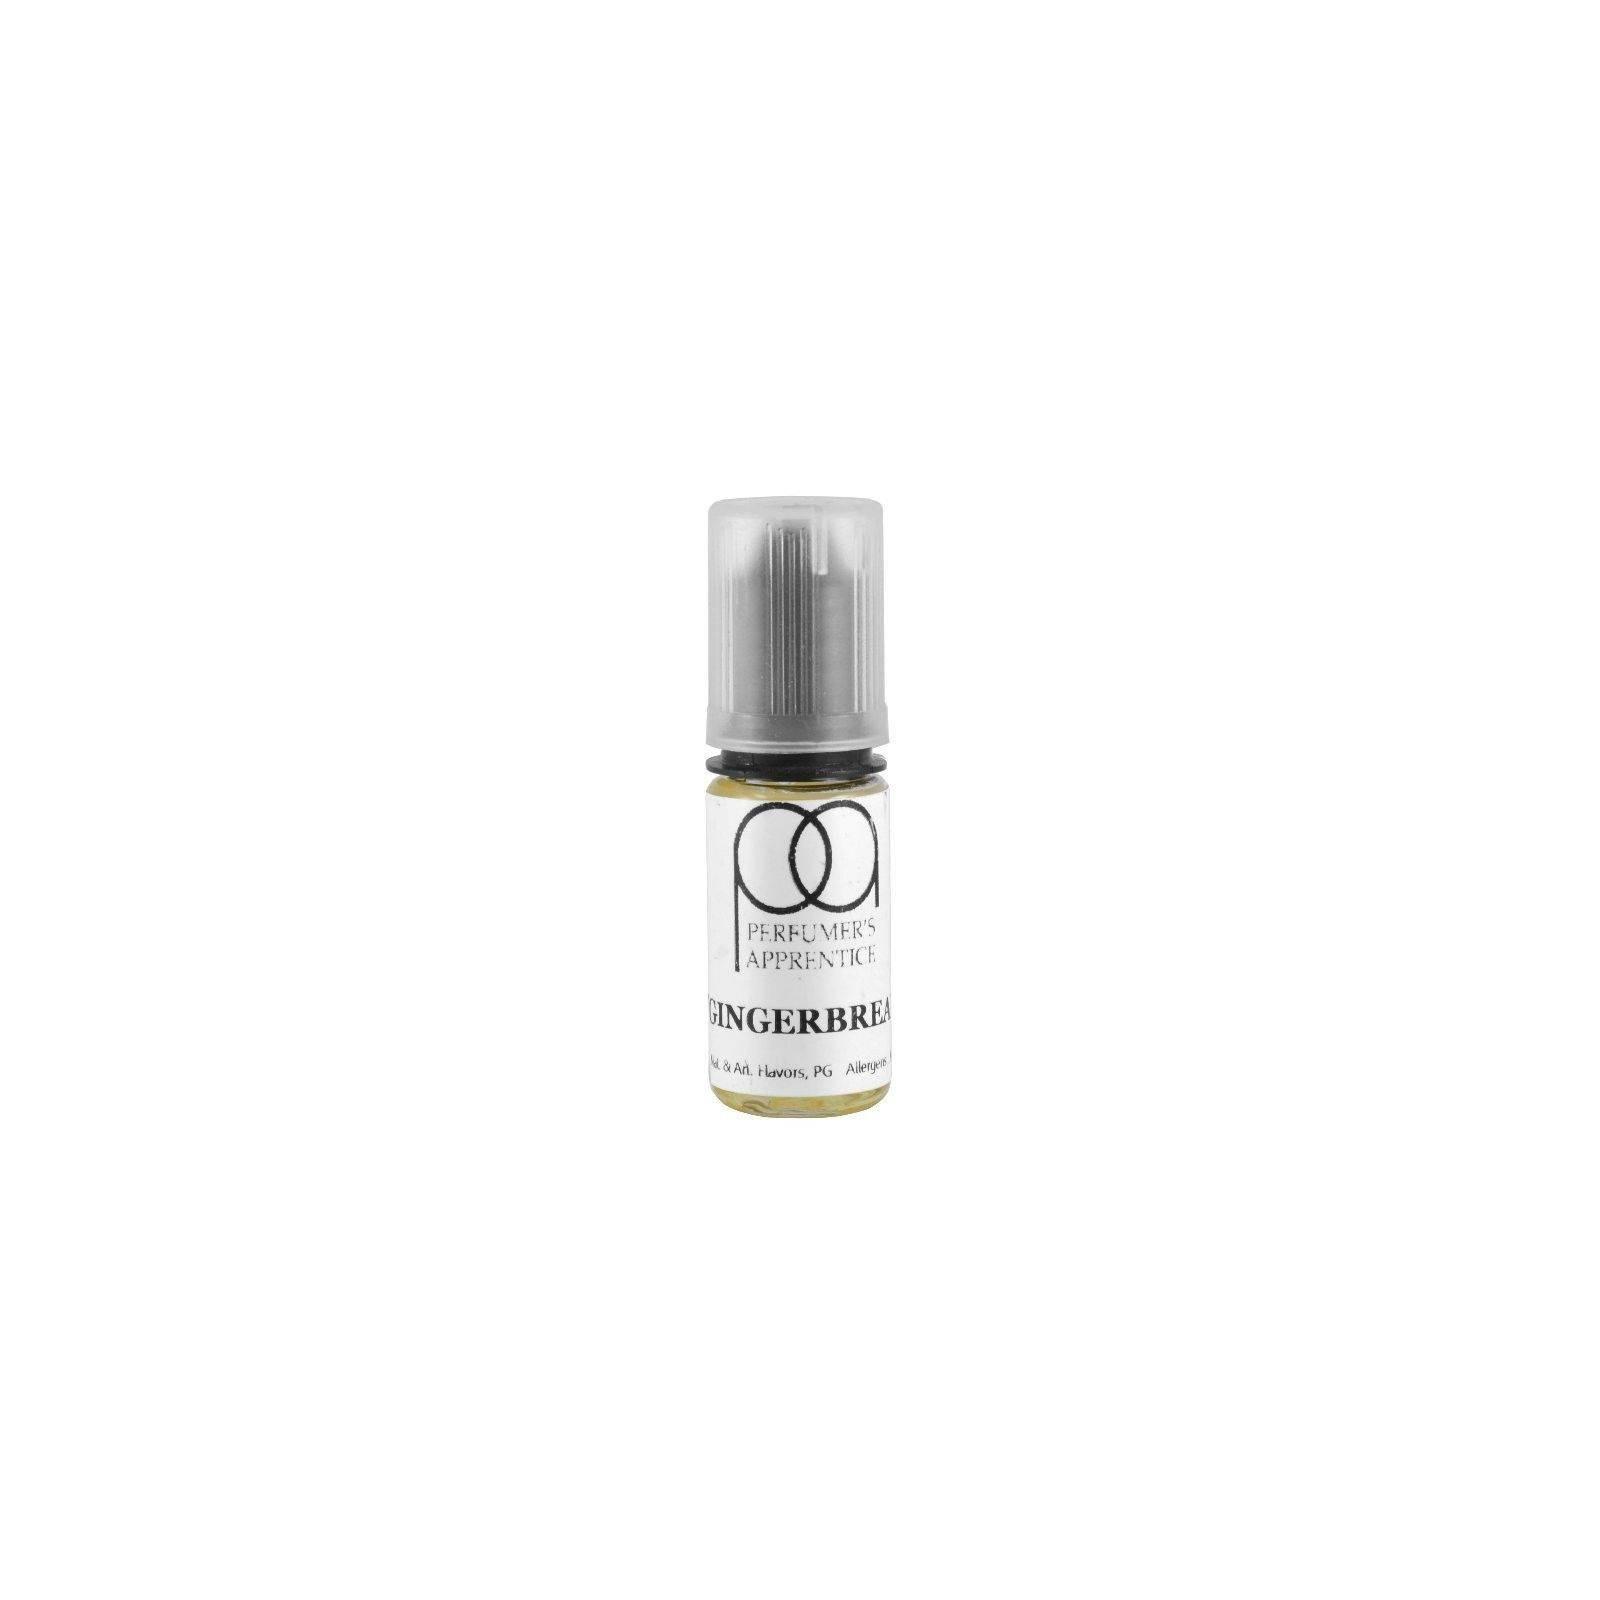 Concentré Gingerbread - Perfumer's Apprentice